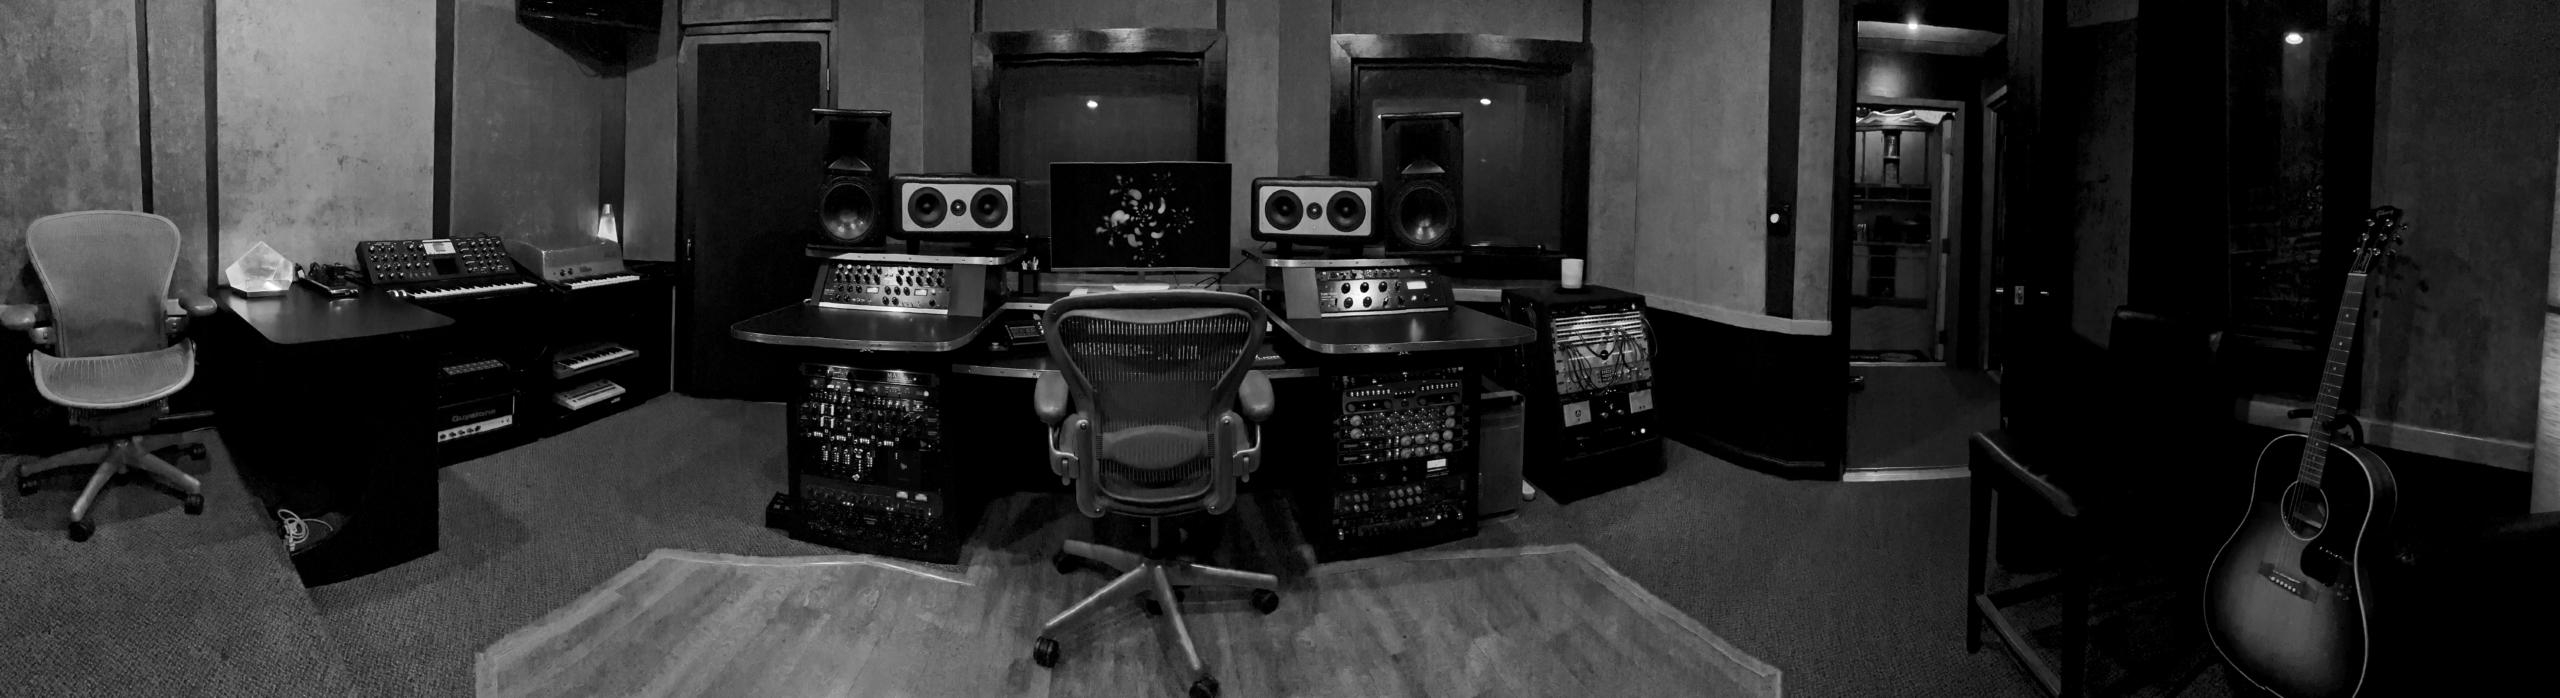 Studio A Pano B&W